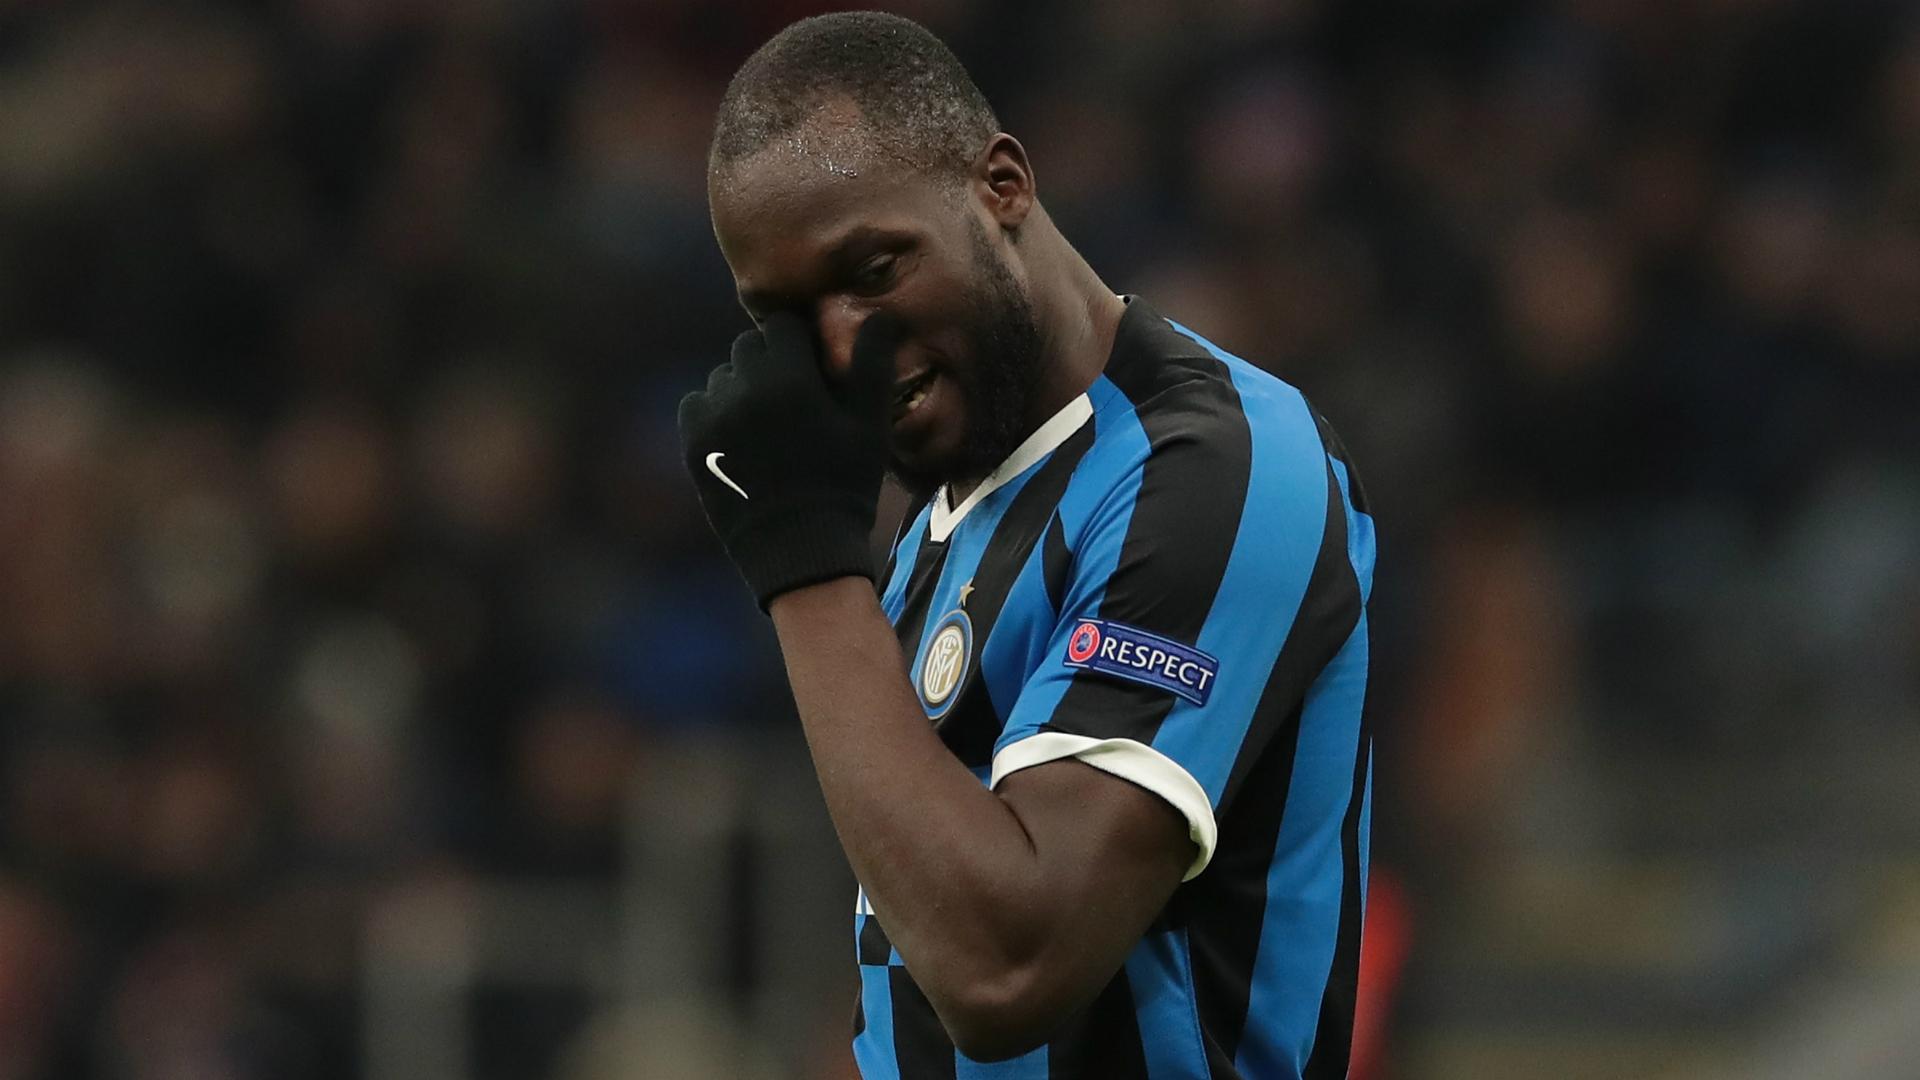 Dybala's failed Man Utd move led to Lukaku joining Inter, claims agent